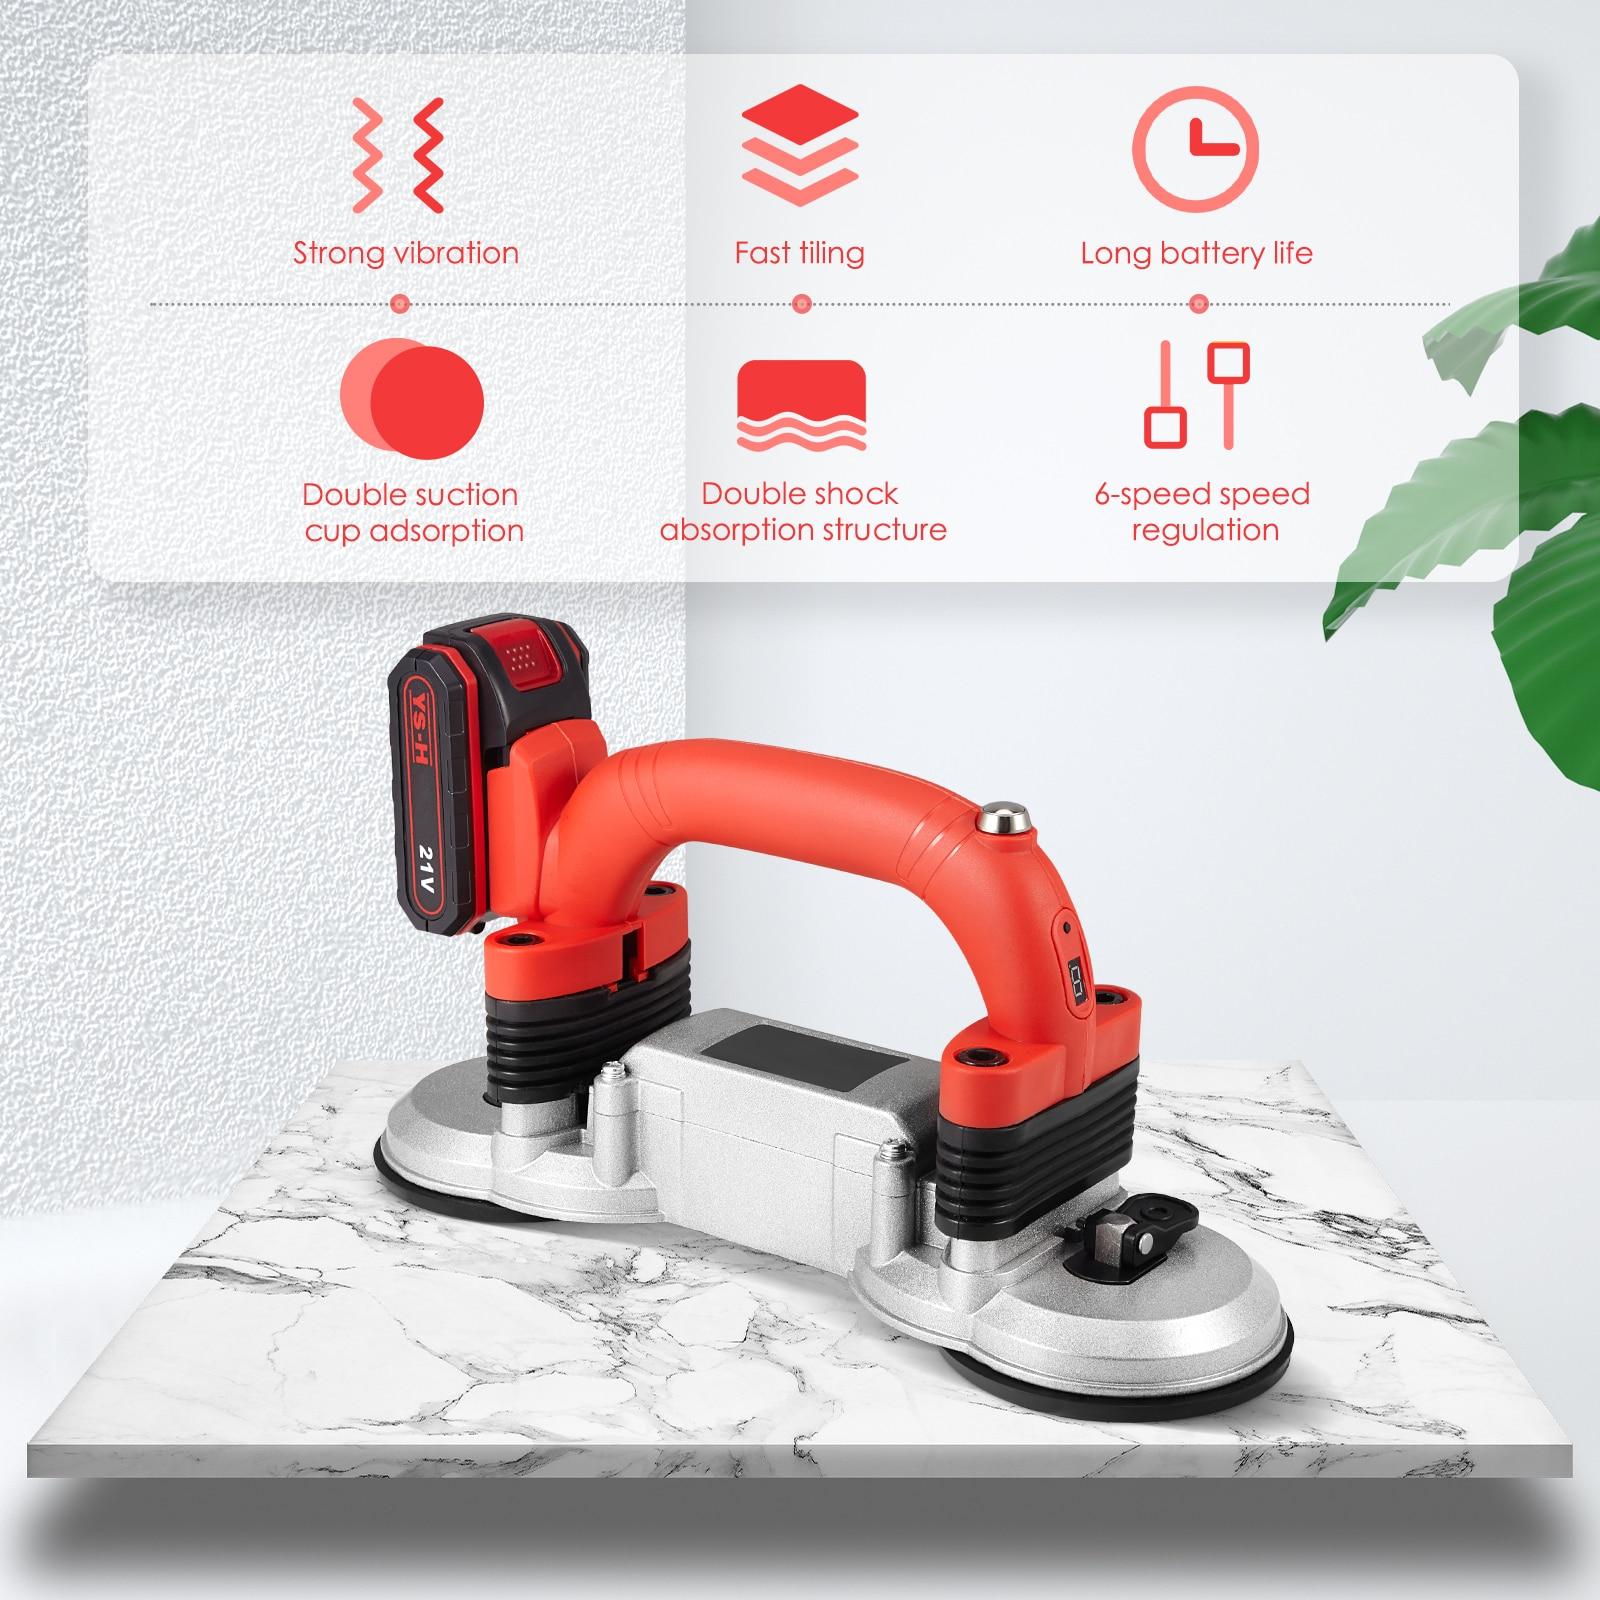 21V Professional Ceramic Tile Tiler Tiling Machine Double Suction Cup Tile Tiler Machine With Battery For Kitchen Living Room